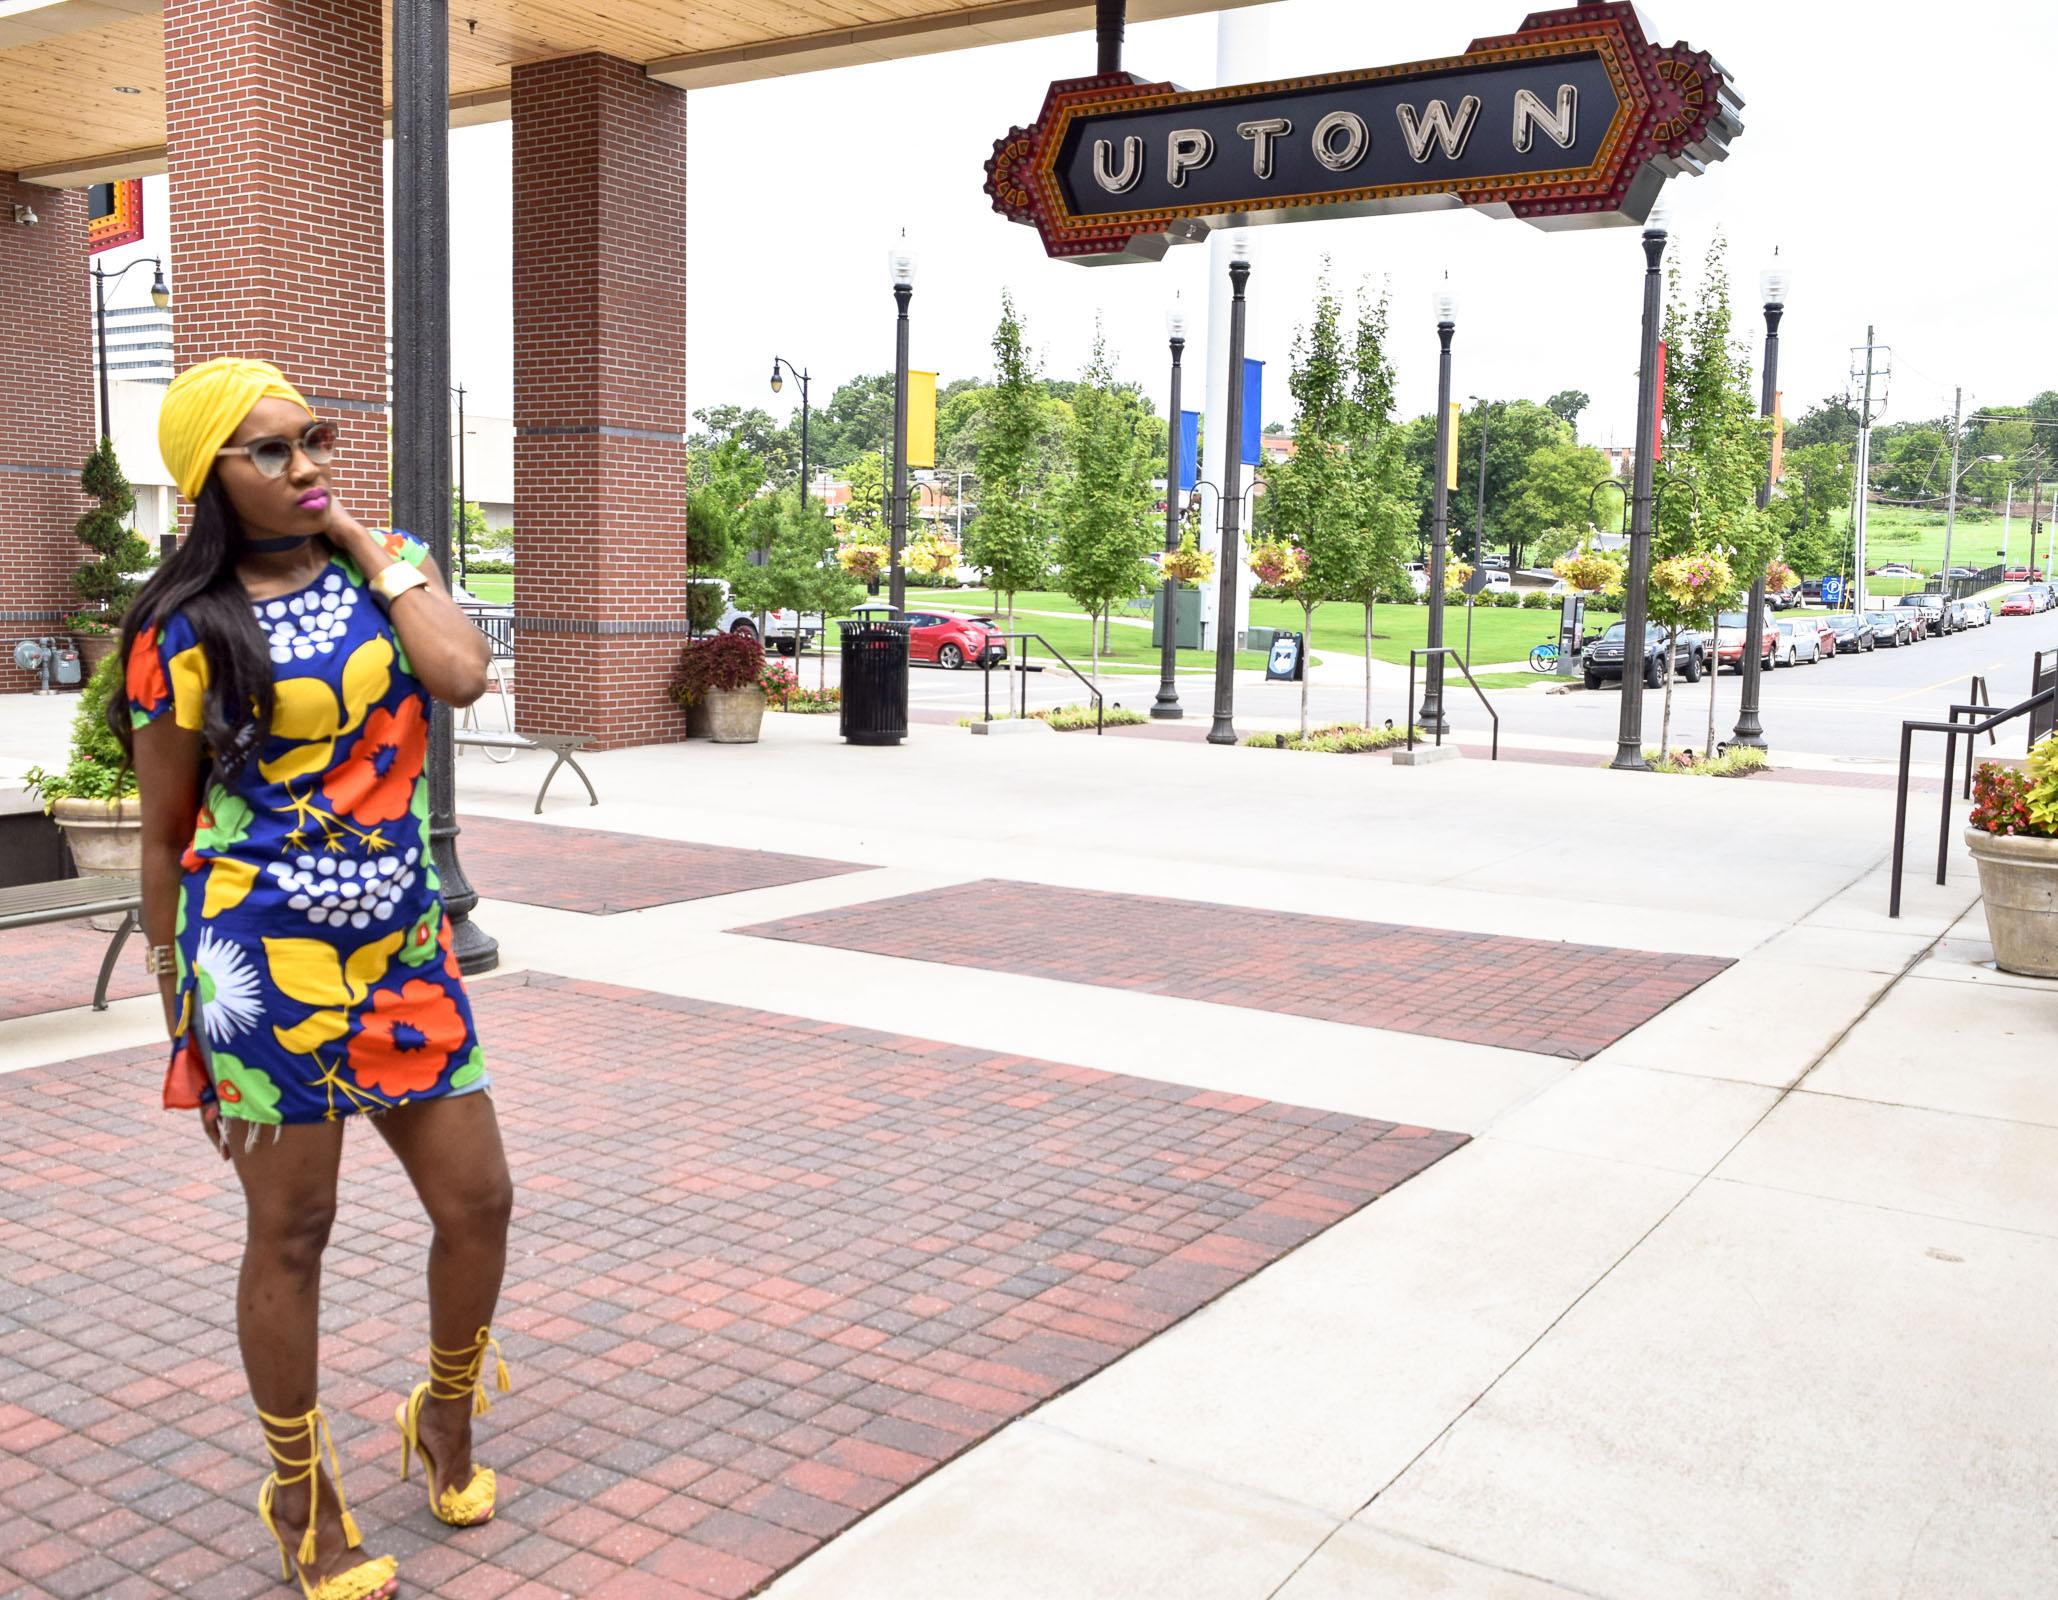 Style-Files-Target-Marimeko-collection -floral-tunic-justfab-tayrey-yellow-fringe-heels-sandals-yellow-turban-asos-denim-choker-oohlalablog-12